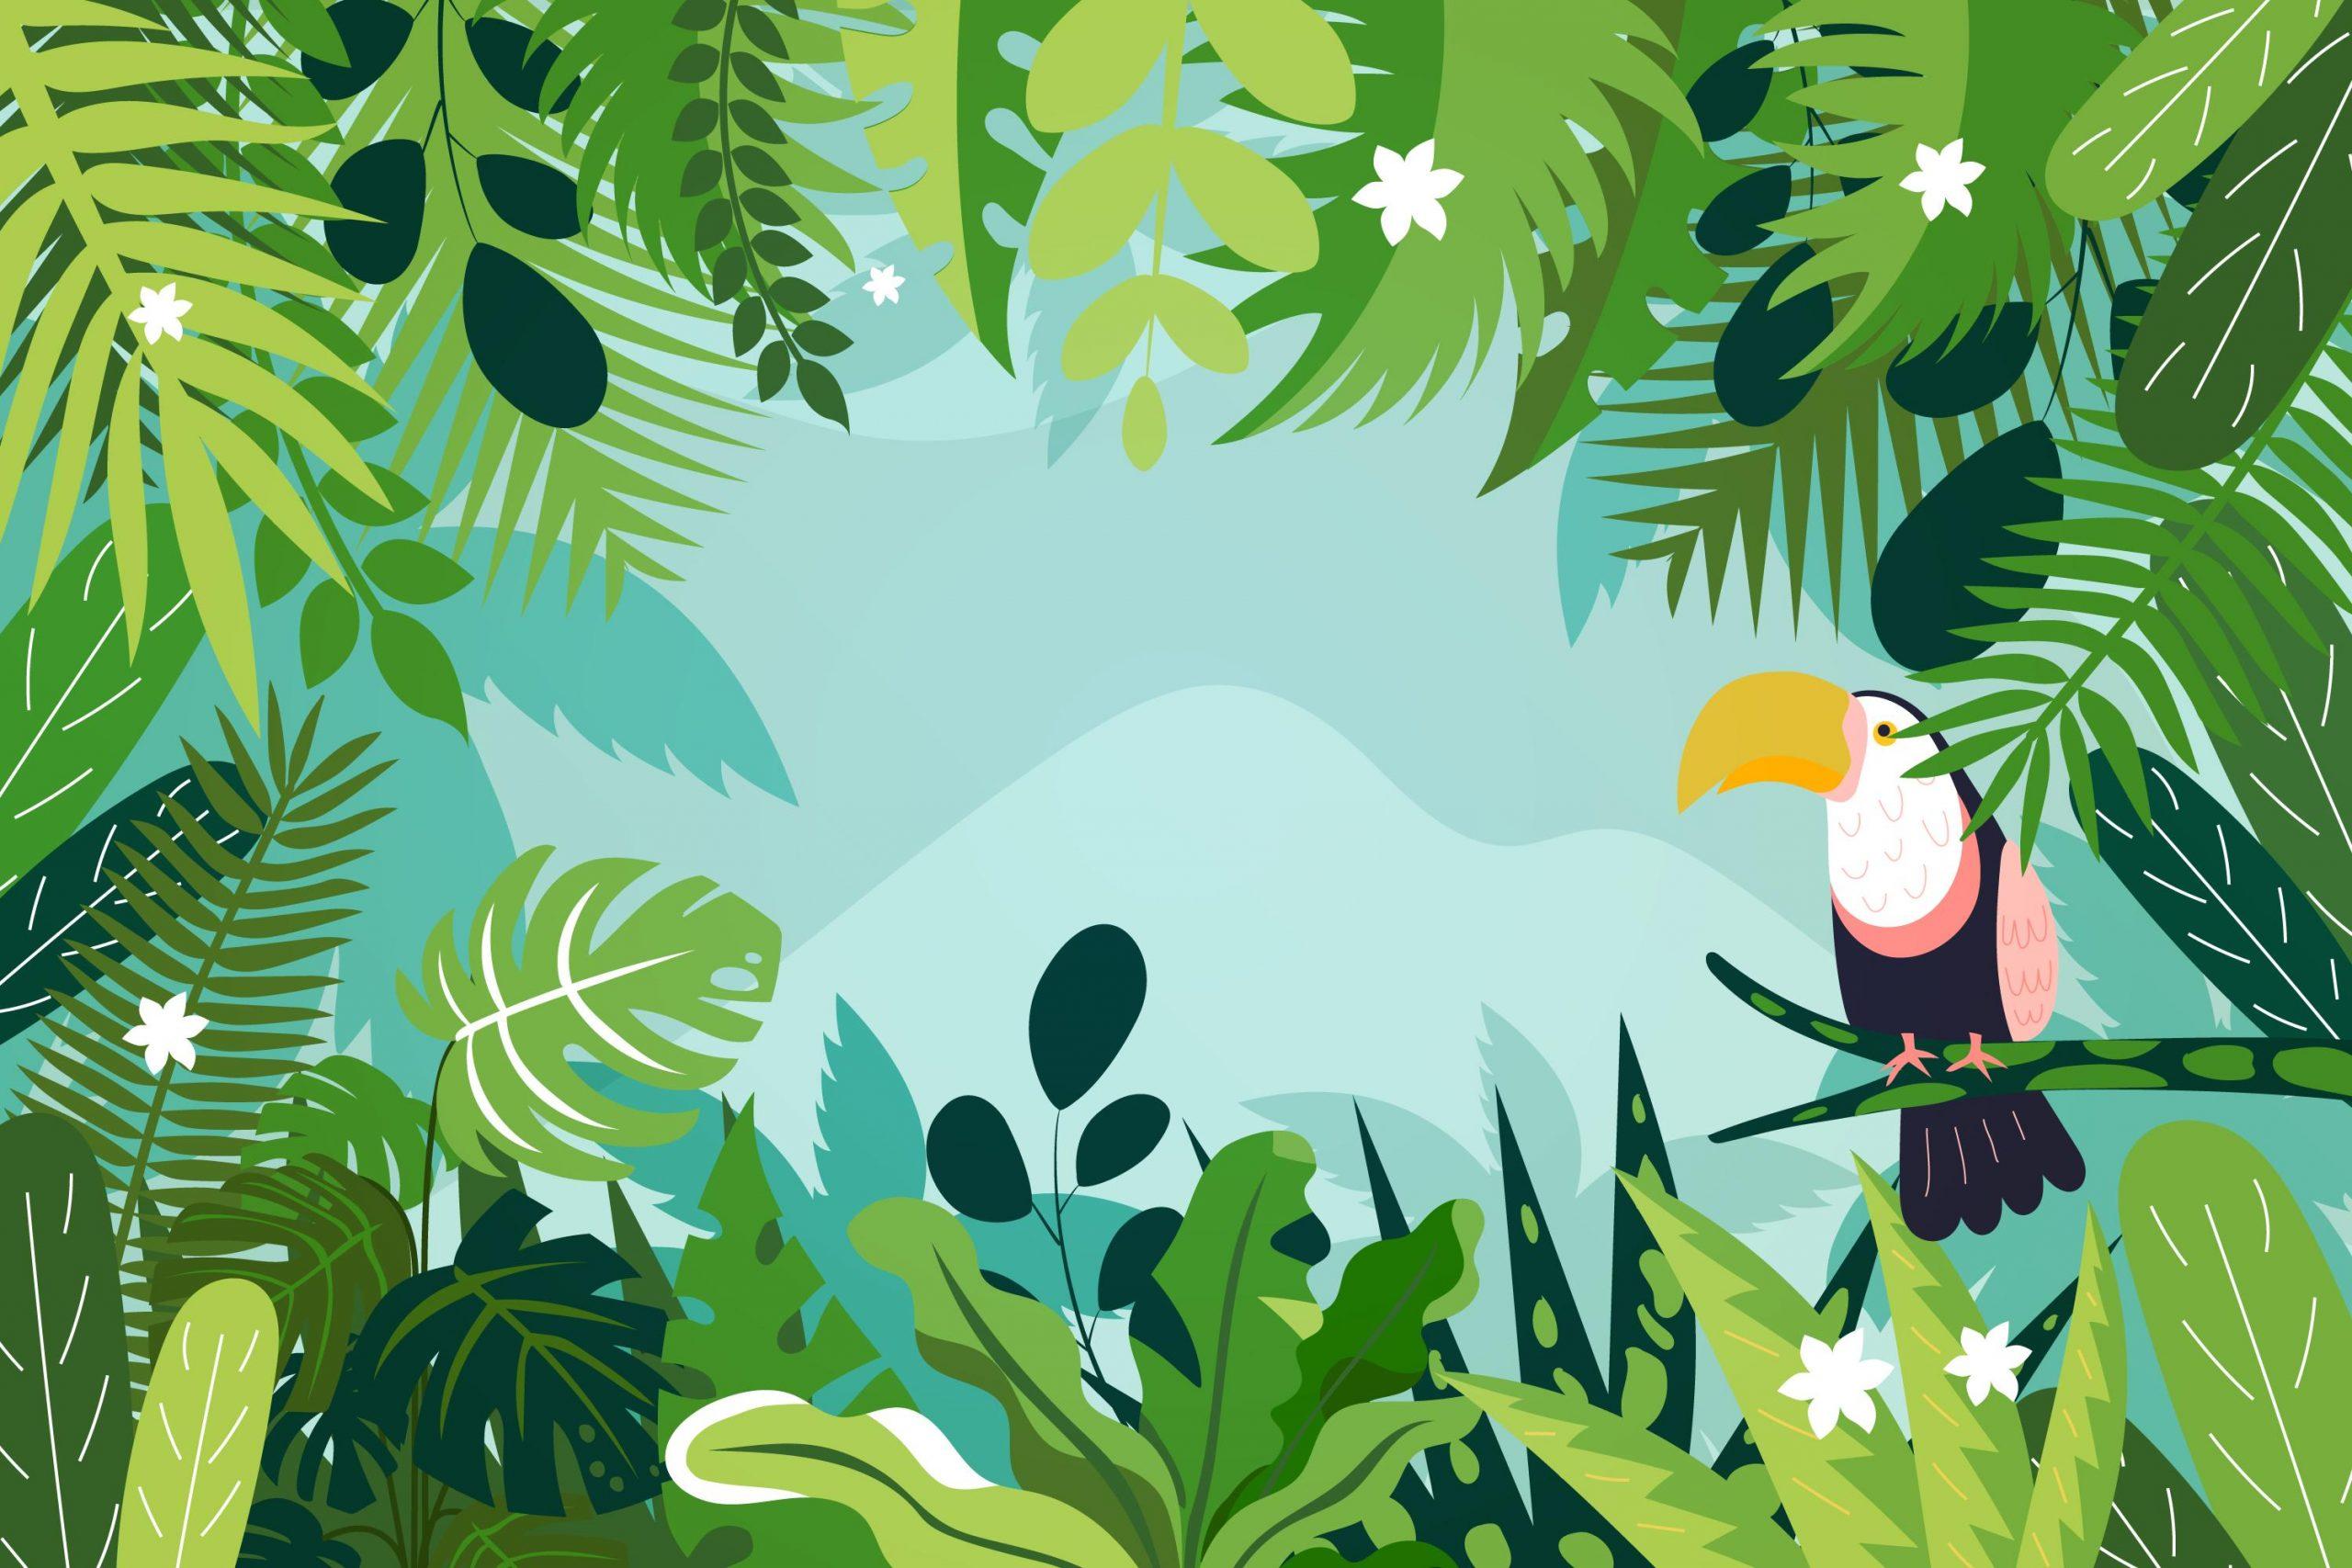 Organic flat jungle background - Background vector created by freepik - www.freepik.com